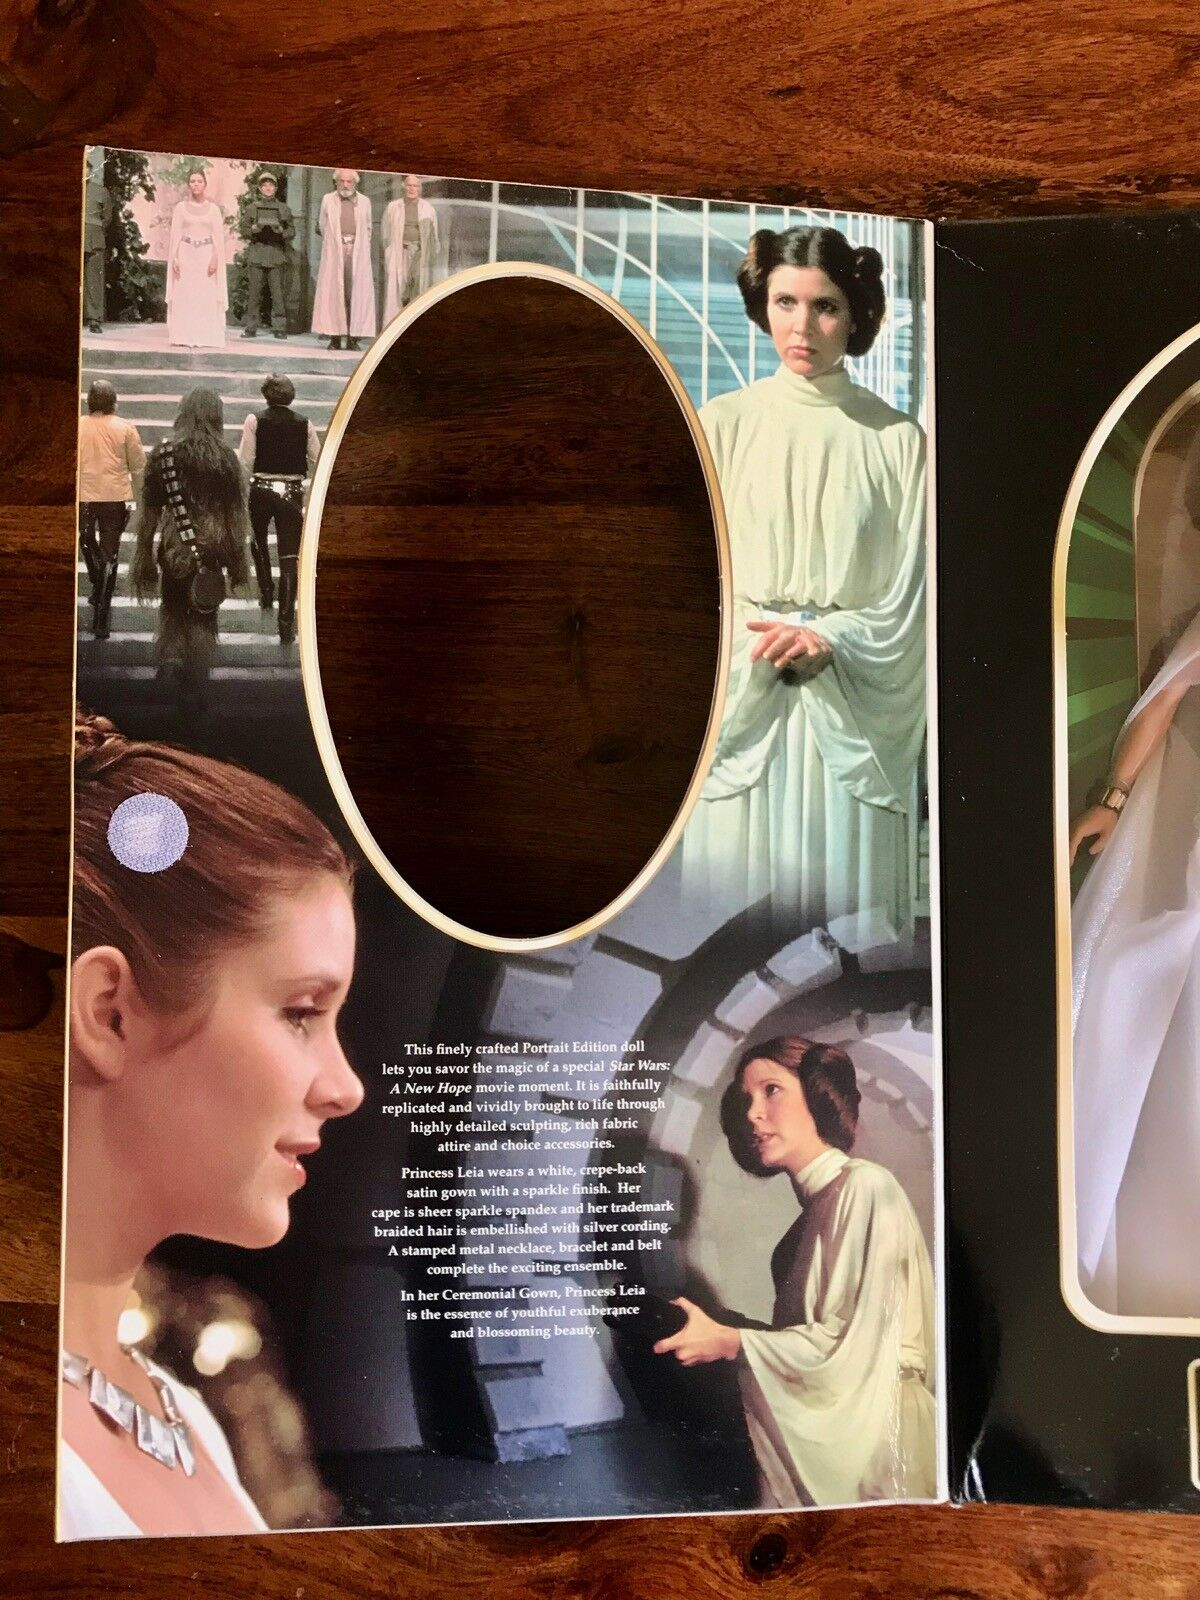 Hasbro Star Wars Princess Leia In Ceremonial Gown 1999 1999 1999 Portrait Edition Figure b719b5